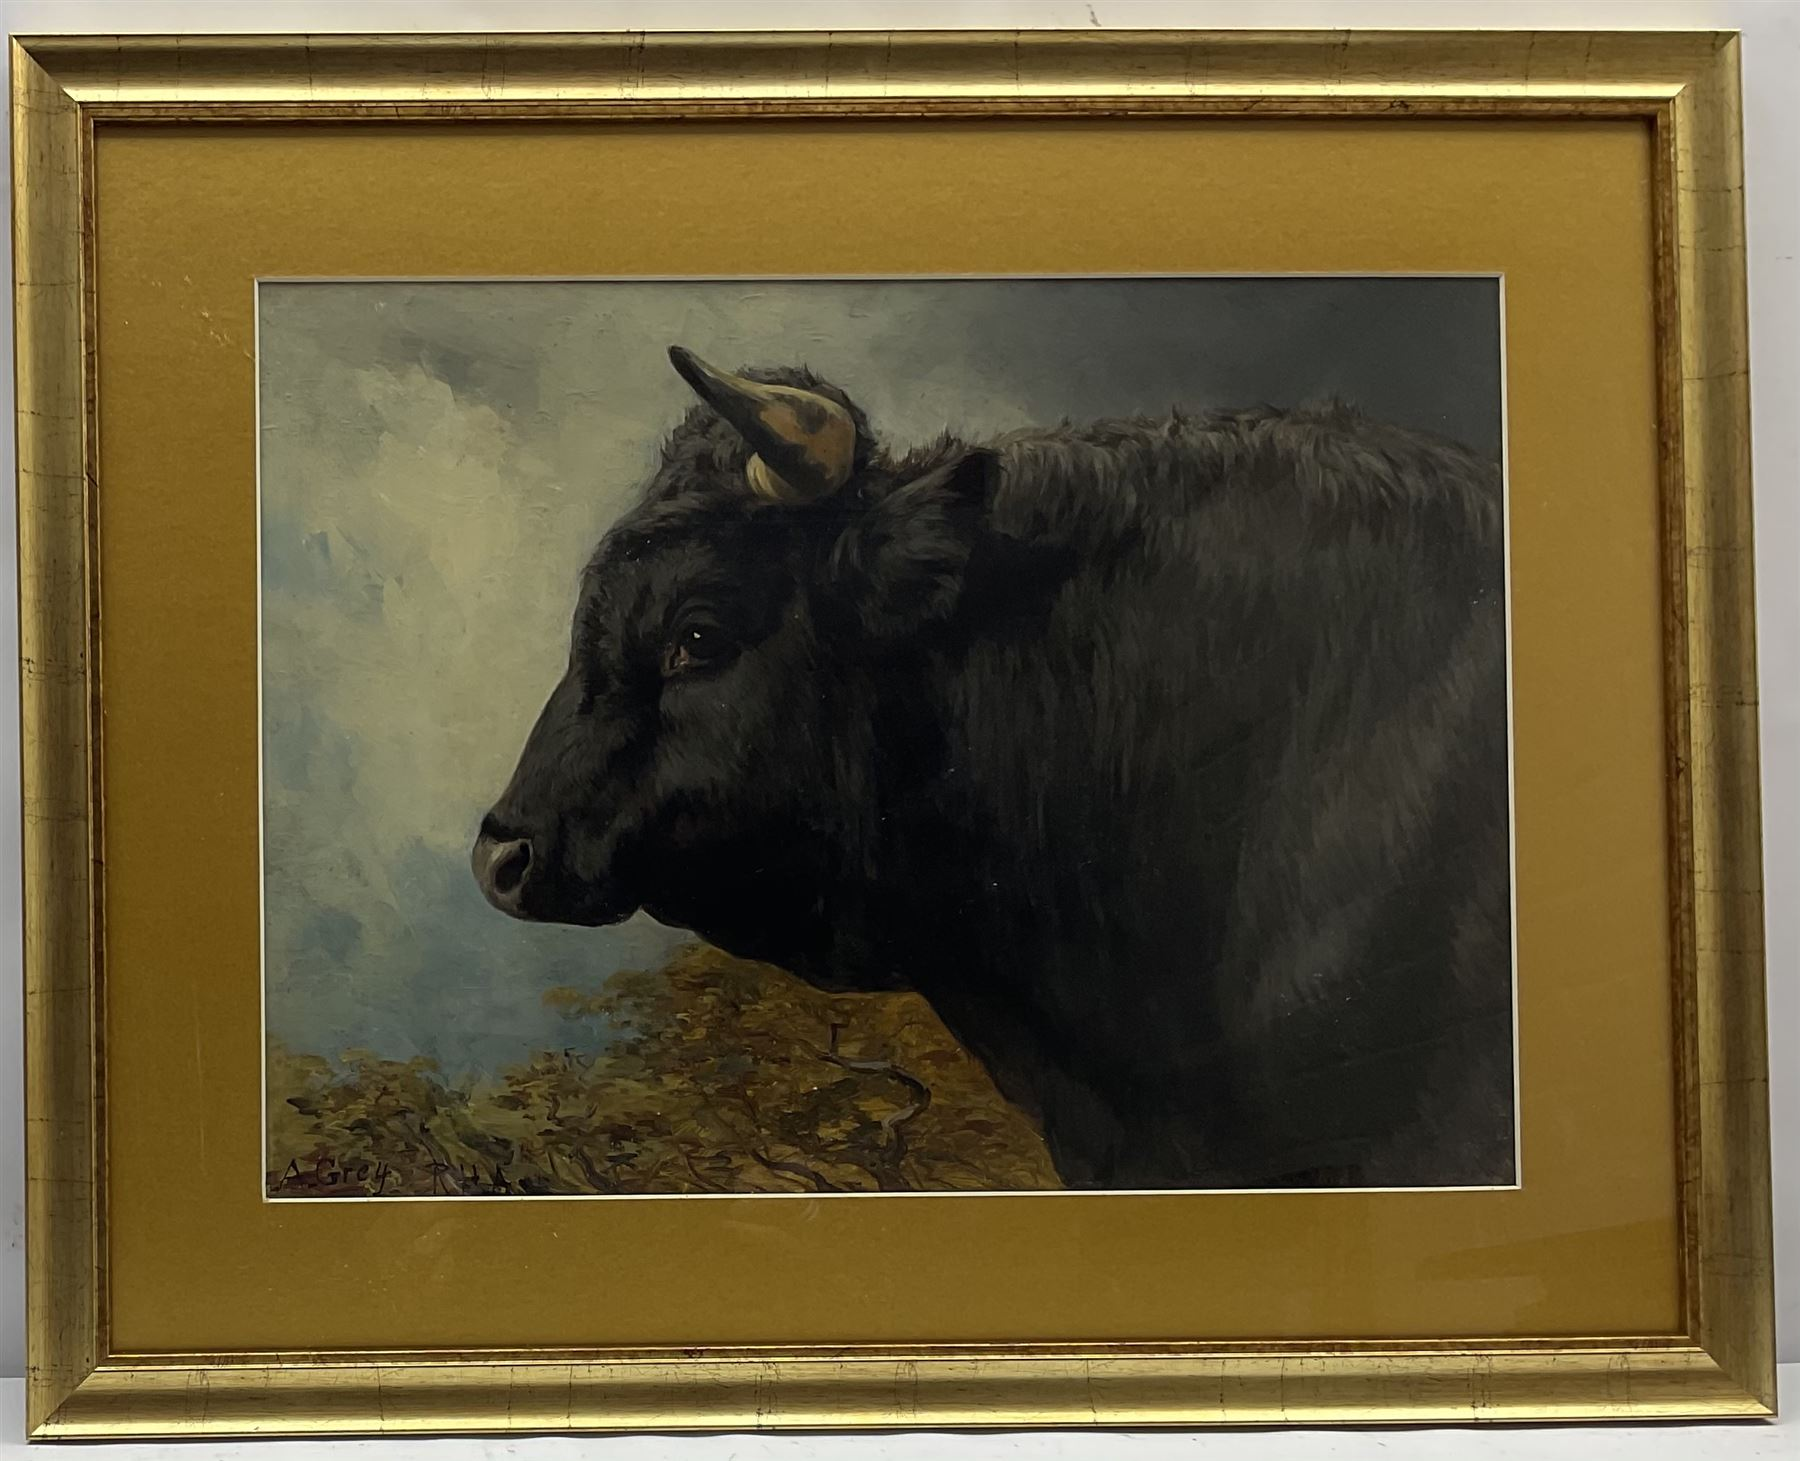 Alfred Grey ARHA (Irish 1845-1926): Study of a Bull's Head - Image 2 of 4